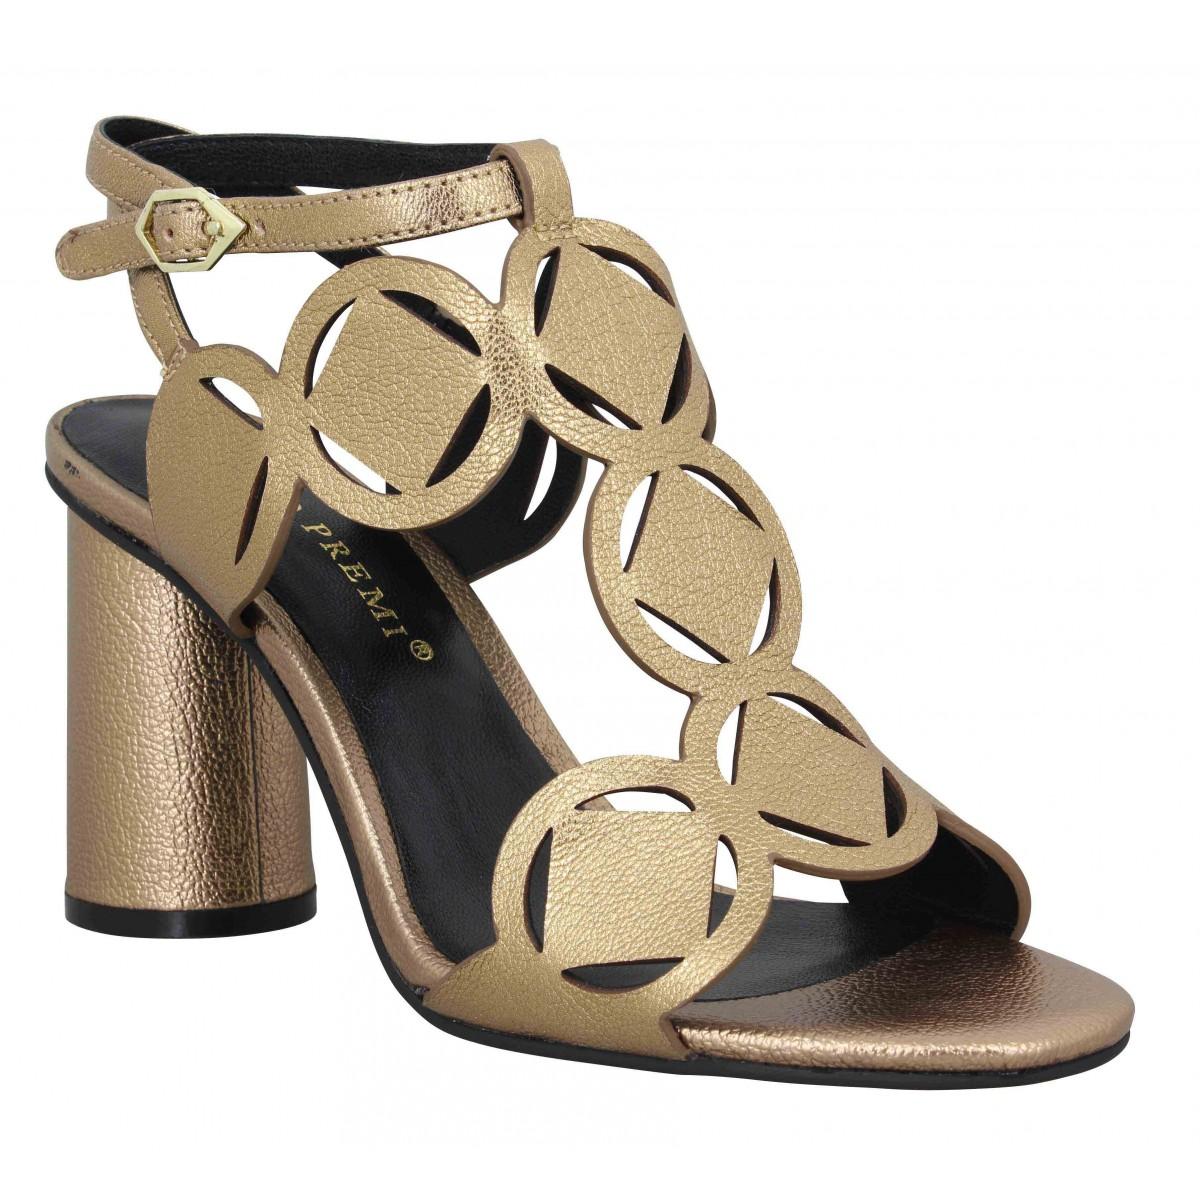 Sandales talons BRUNO PREMI 347 cuir Femme Bronze